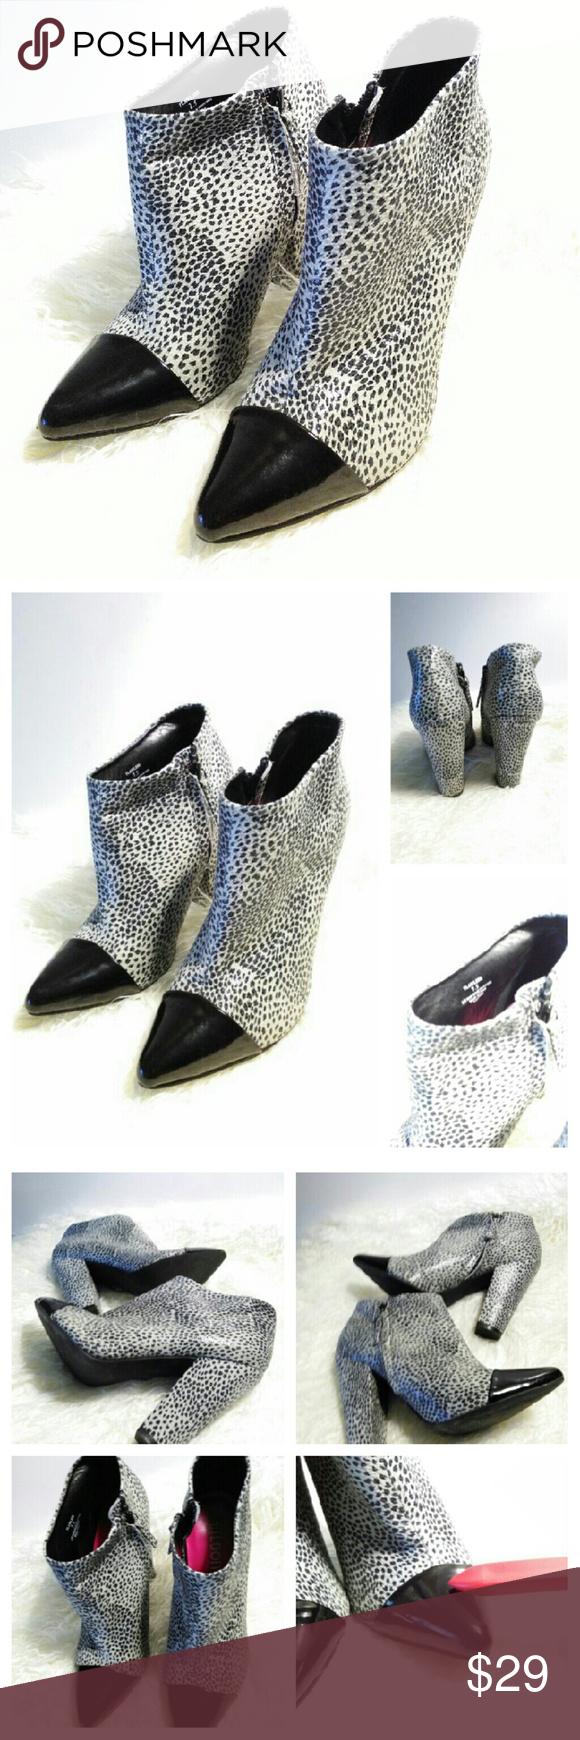 "Tildon Ankle Boots sz 7.5  blk/white Tildon Ankle Boots sz 7.5  blk/white 4"" heel Has some scuffs Tildon Shoes Ankle Boots & Booties"